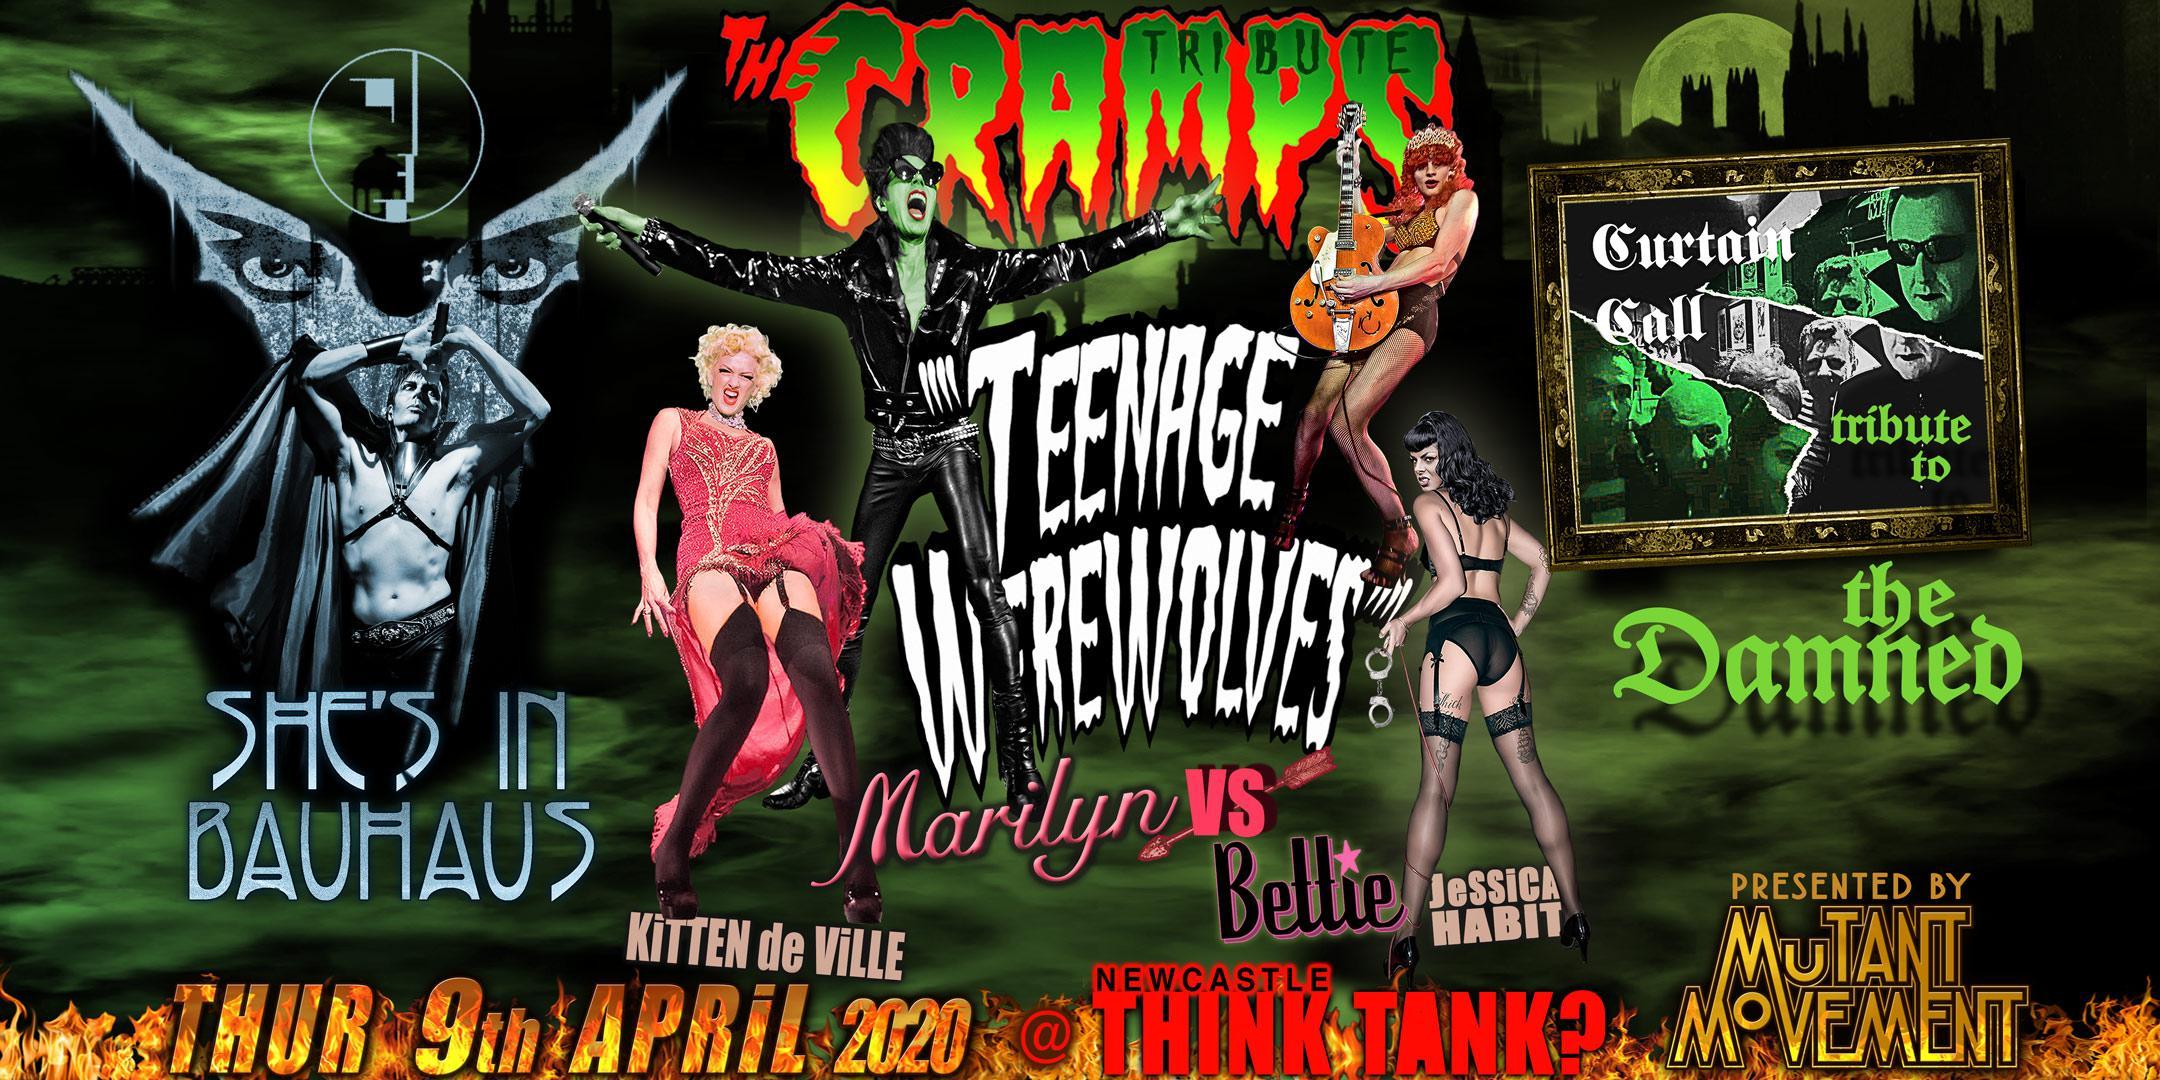 Teenage Werewolves(The Cramps tribute)She'sInBauhaus/Curtain Call NEWCASTLE